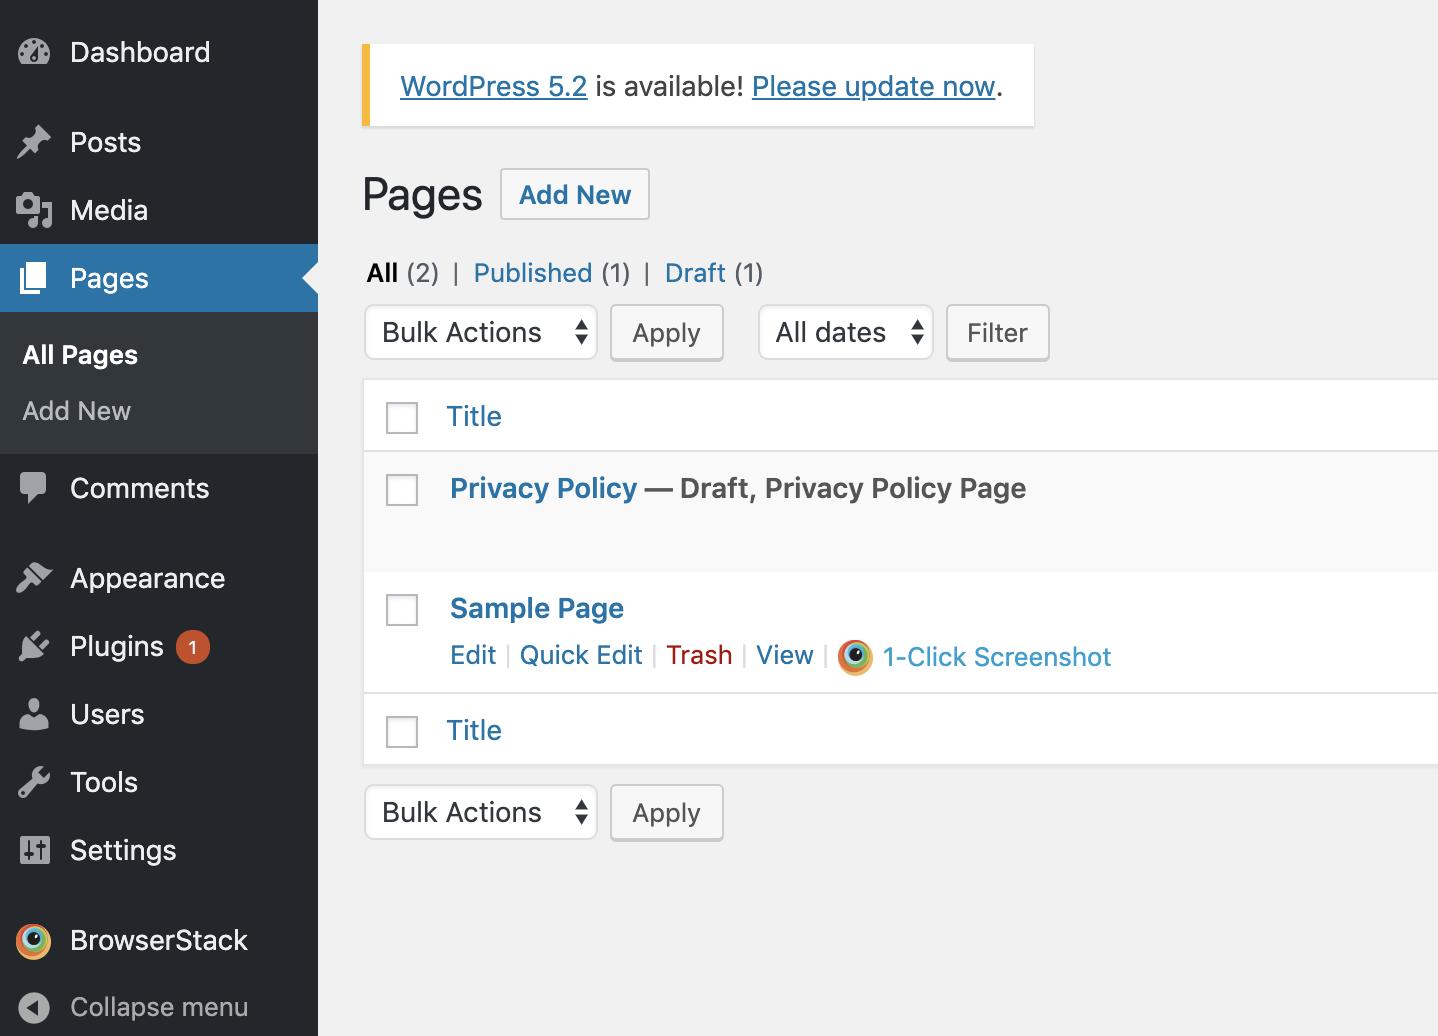 BrowserStack for WordPress